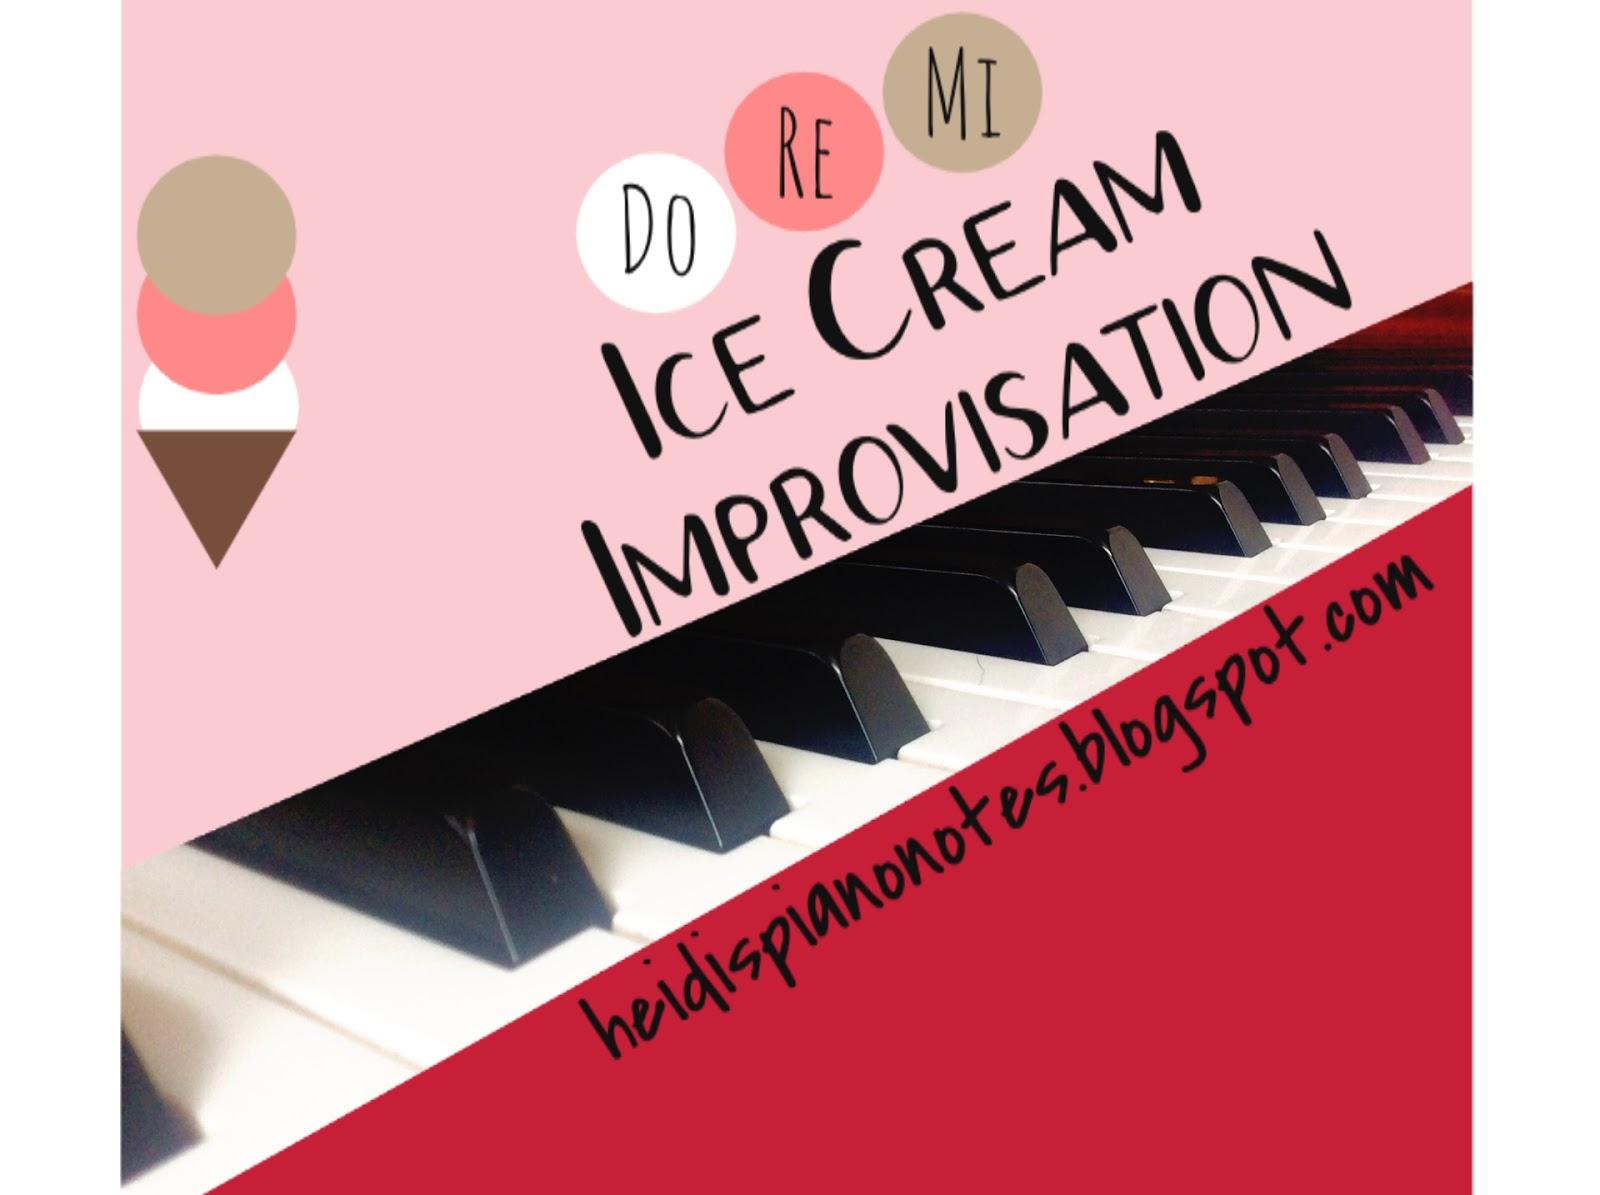 graphic regarding Beginner Piano Lessons Printable identify Heidis Piano Studio: Totally free Printable Piano Improvisation for